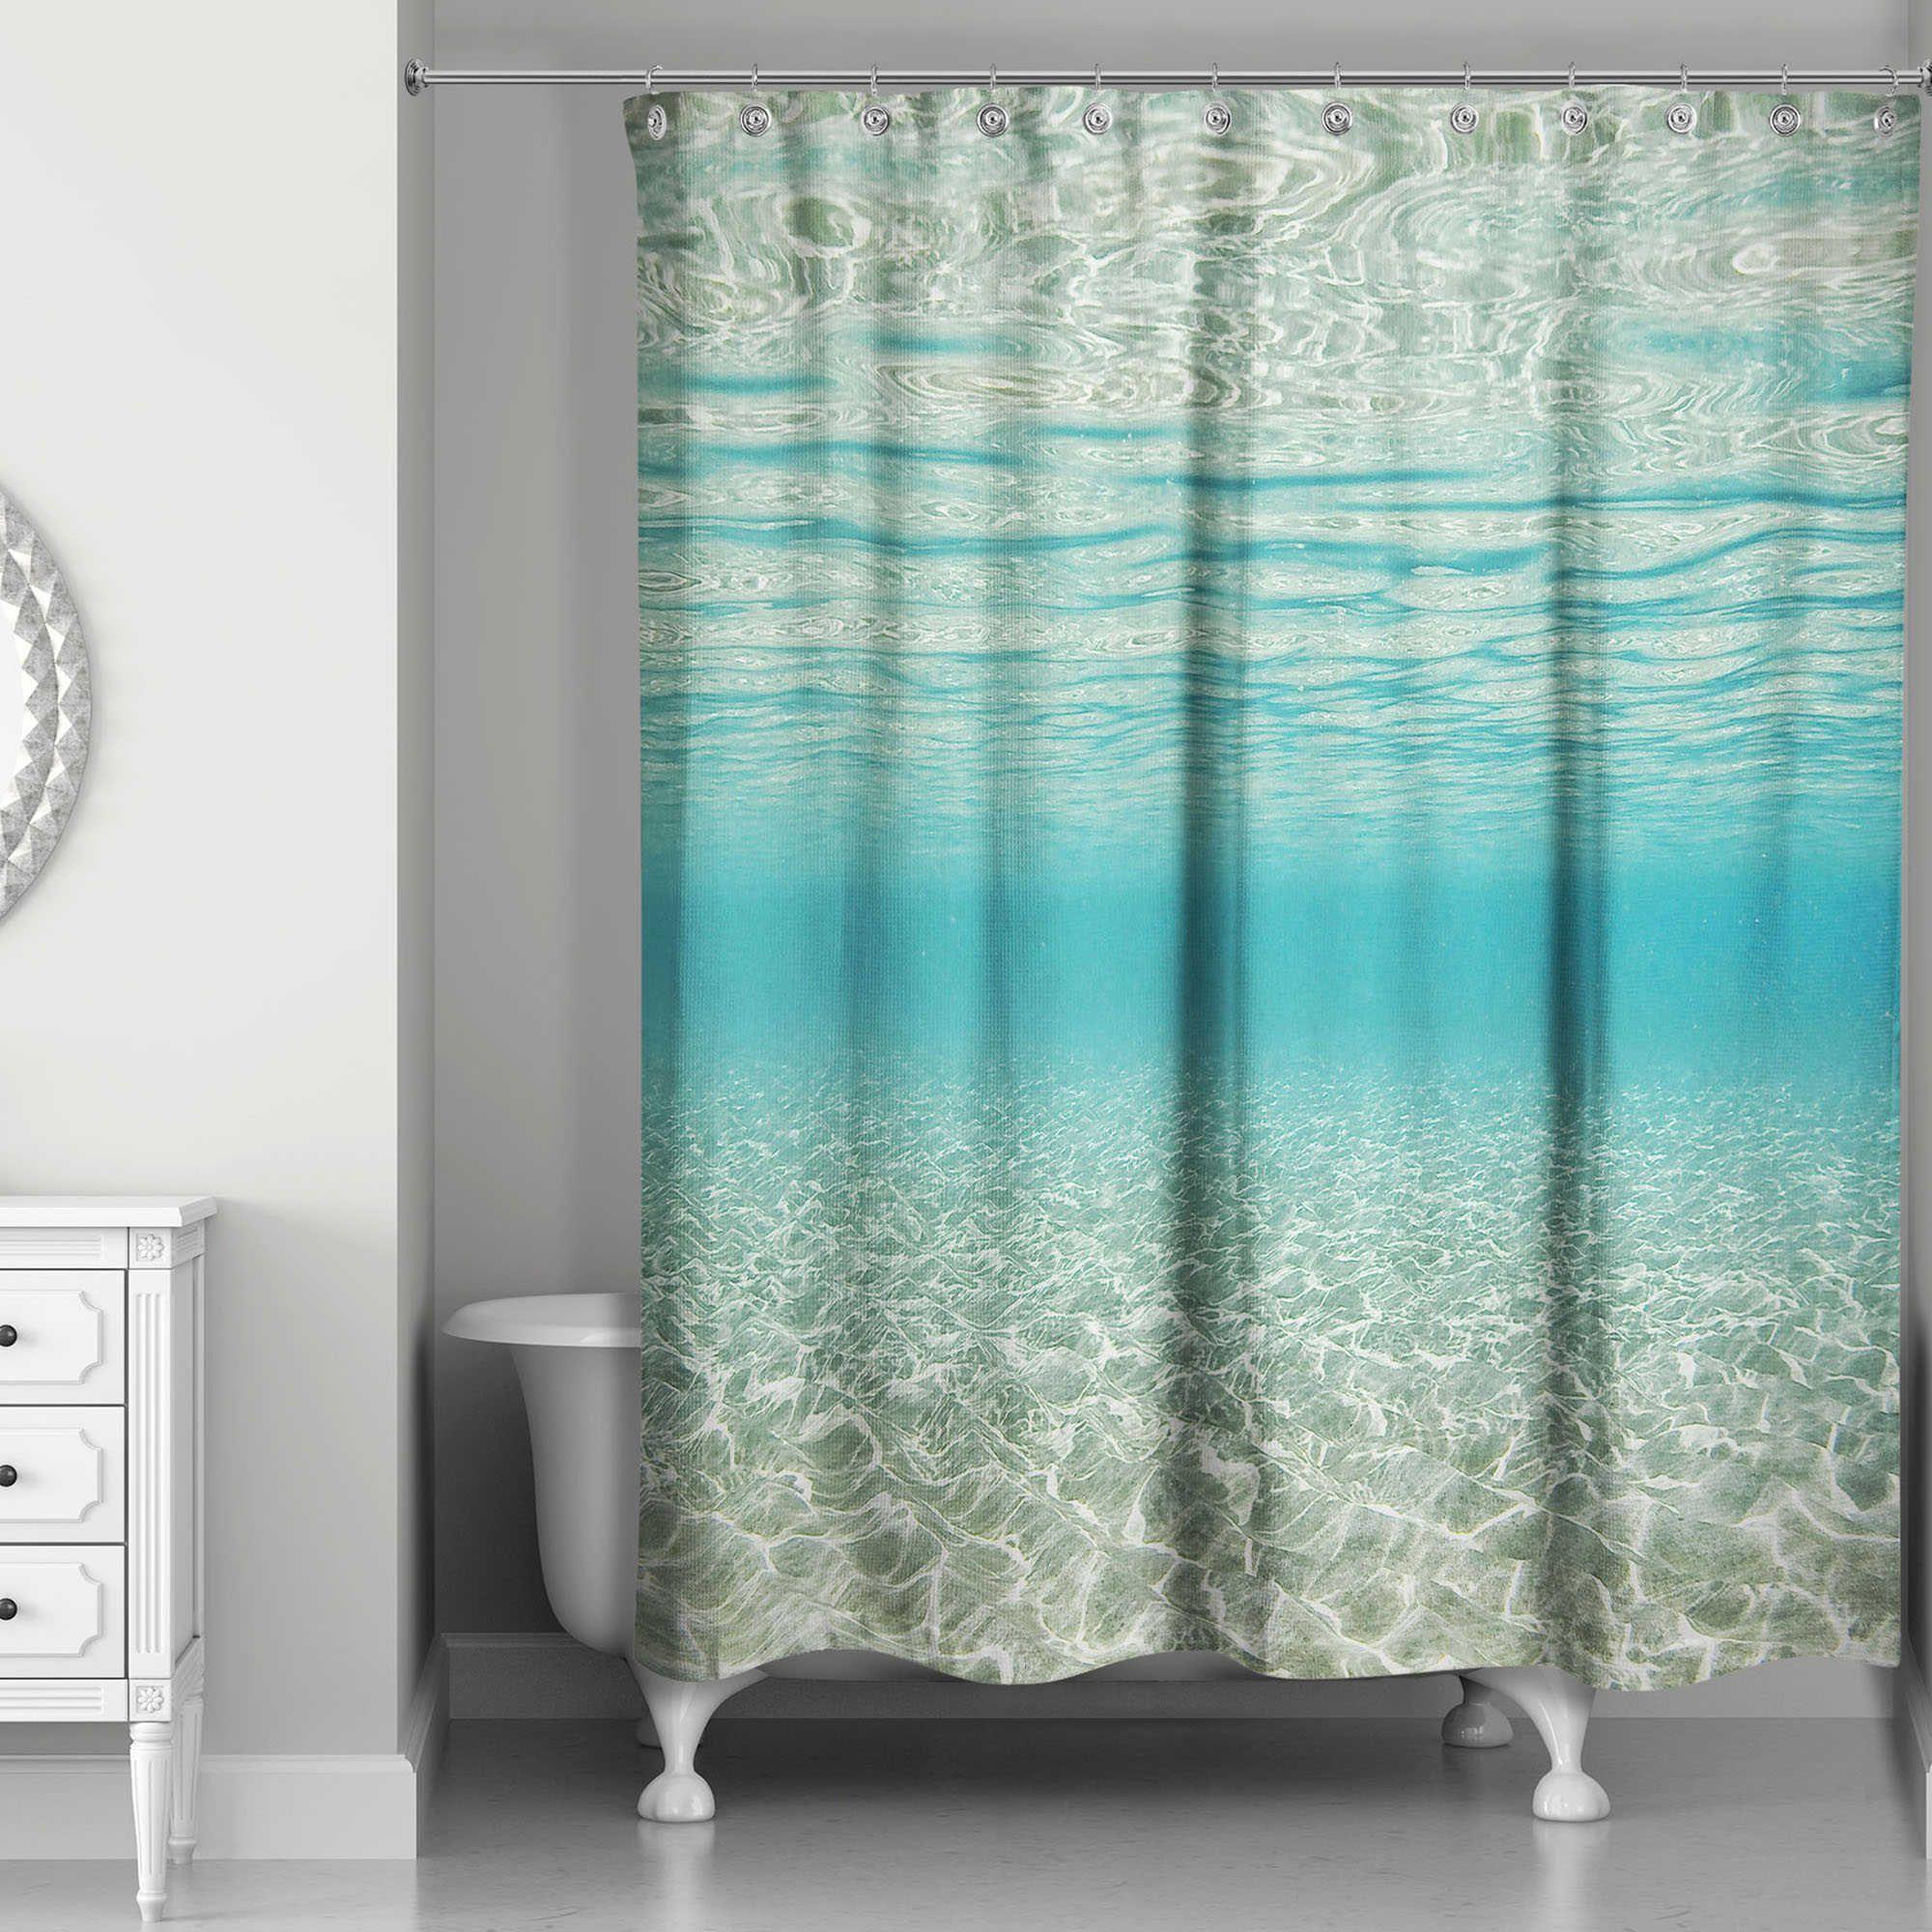 Designs Direct Under The Ocean Shower Curtain In Blue Ocean